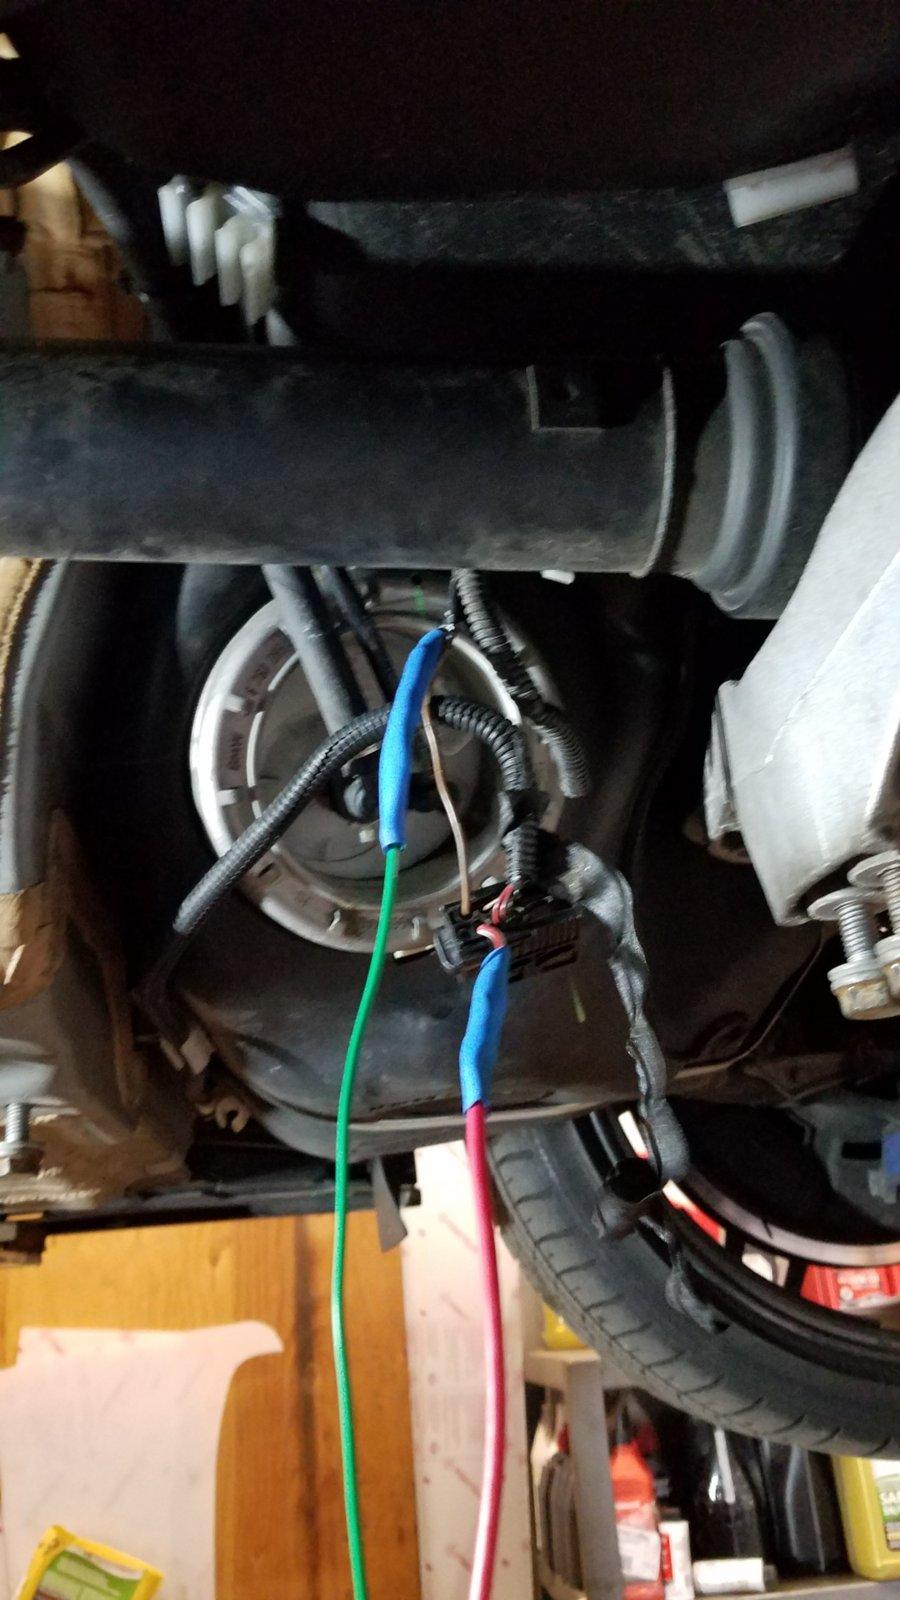 Walbro 525 wiring | BMW Forums - SpoolStreet